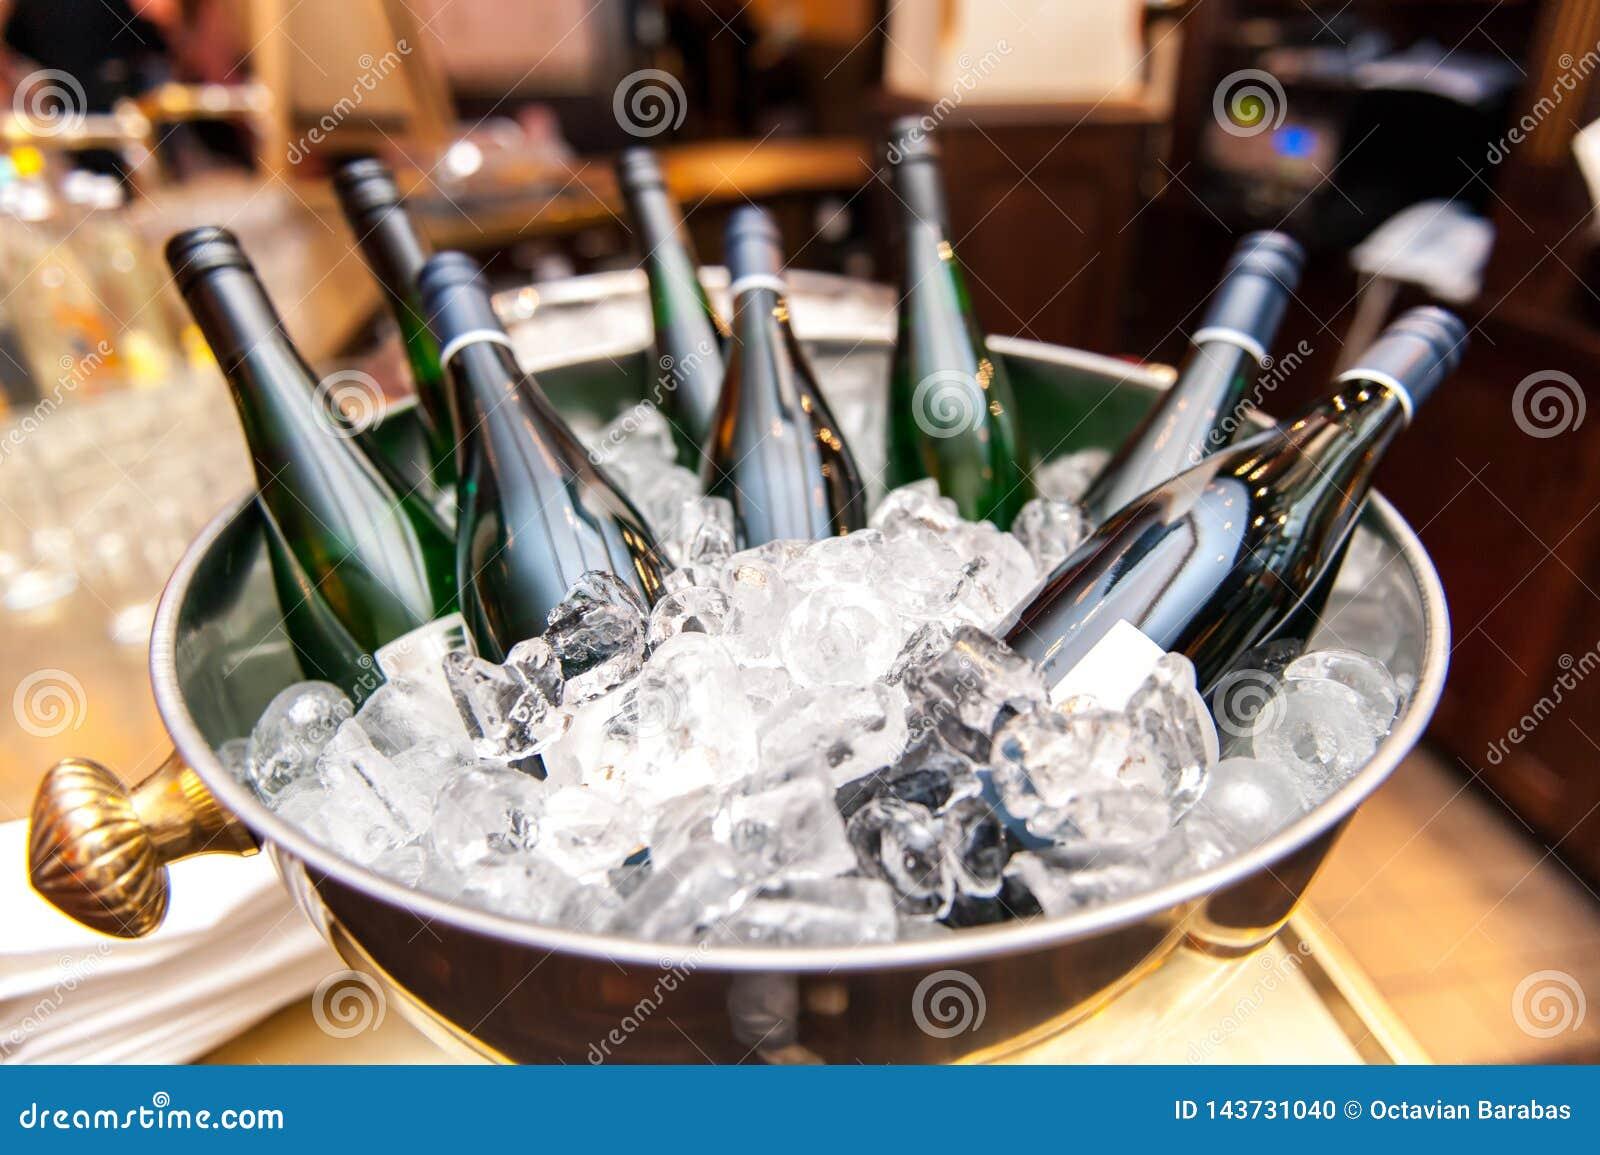 White wine bottles in bowl of ice